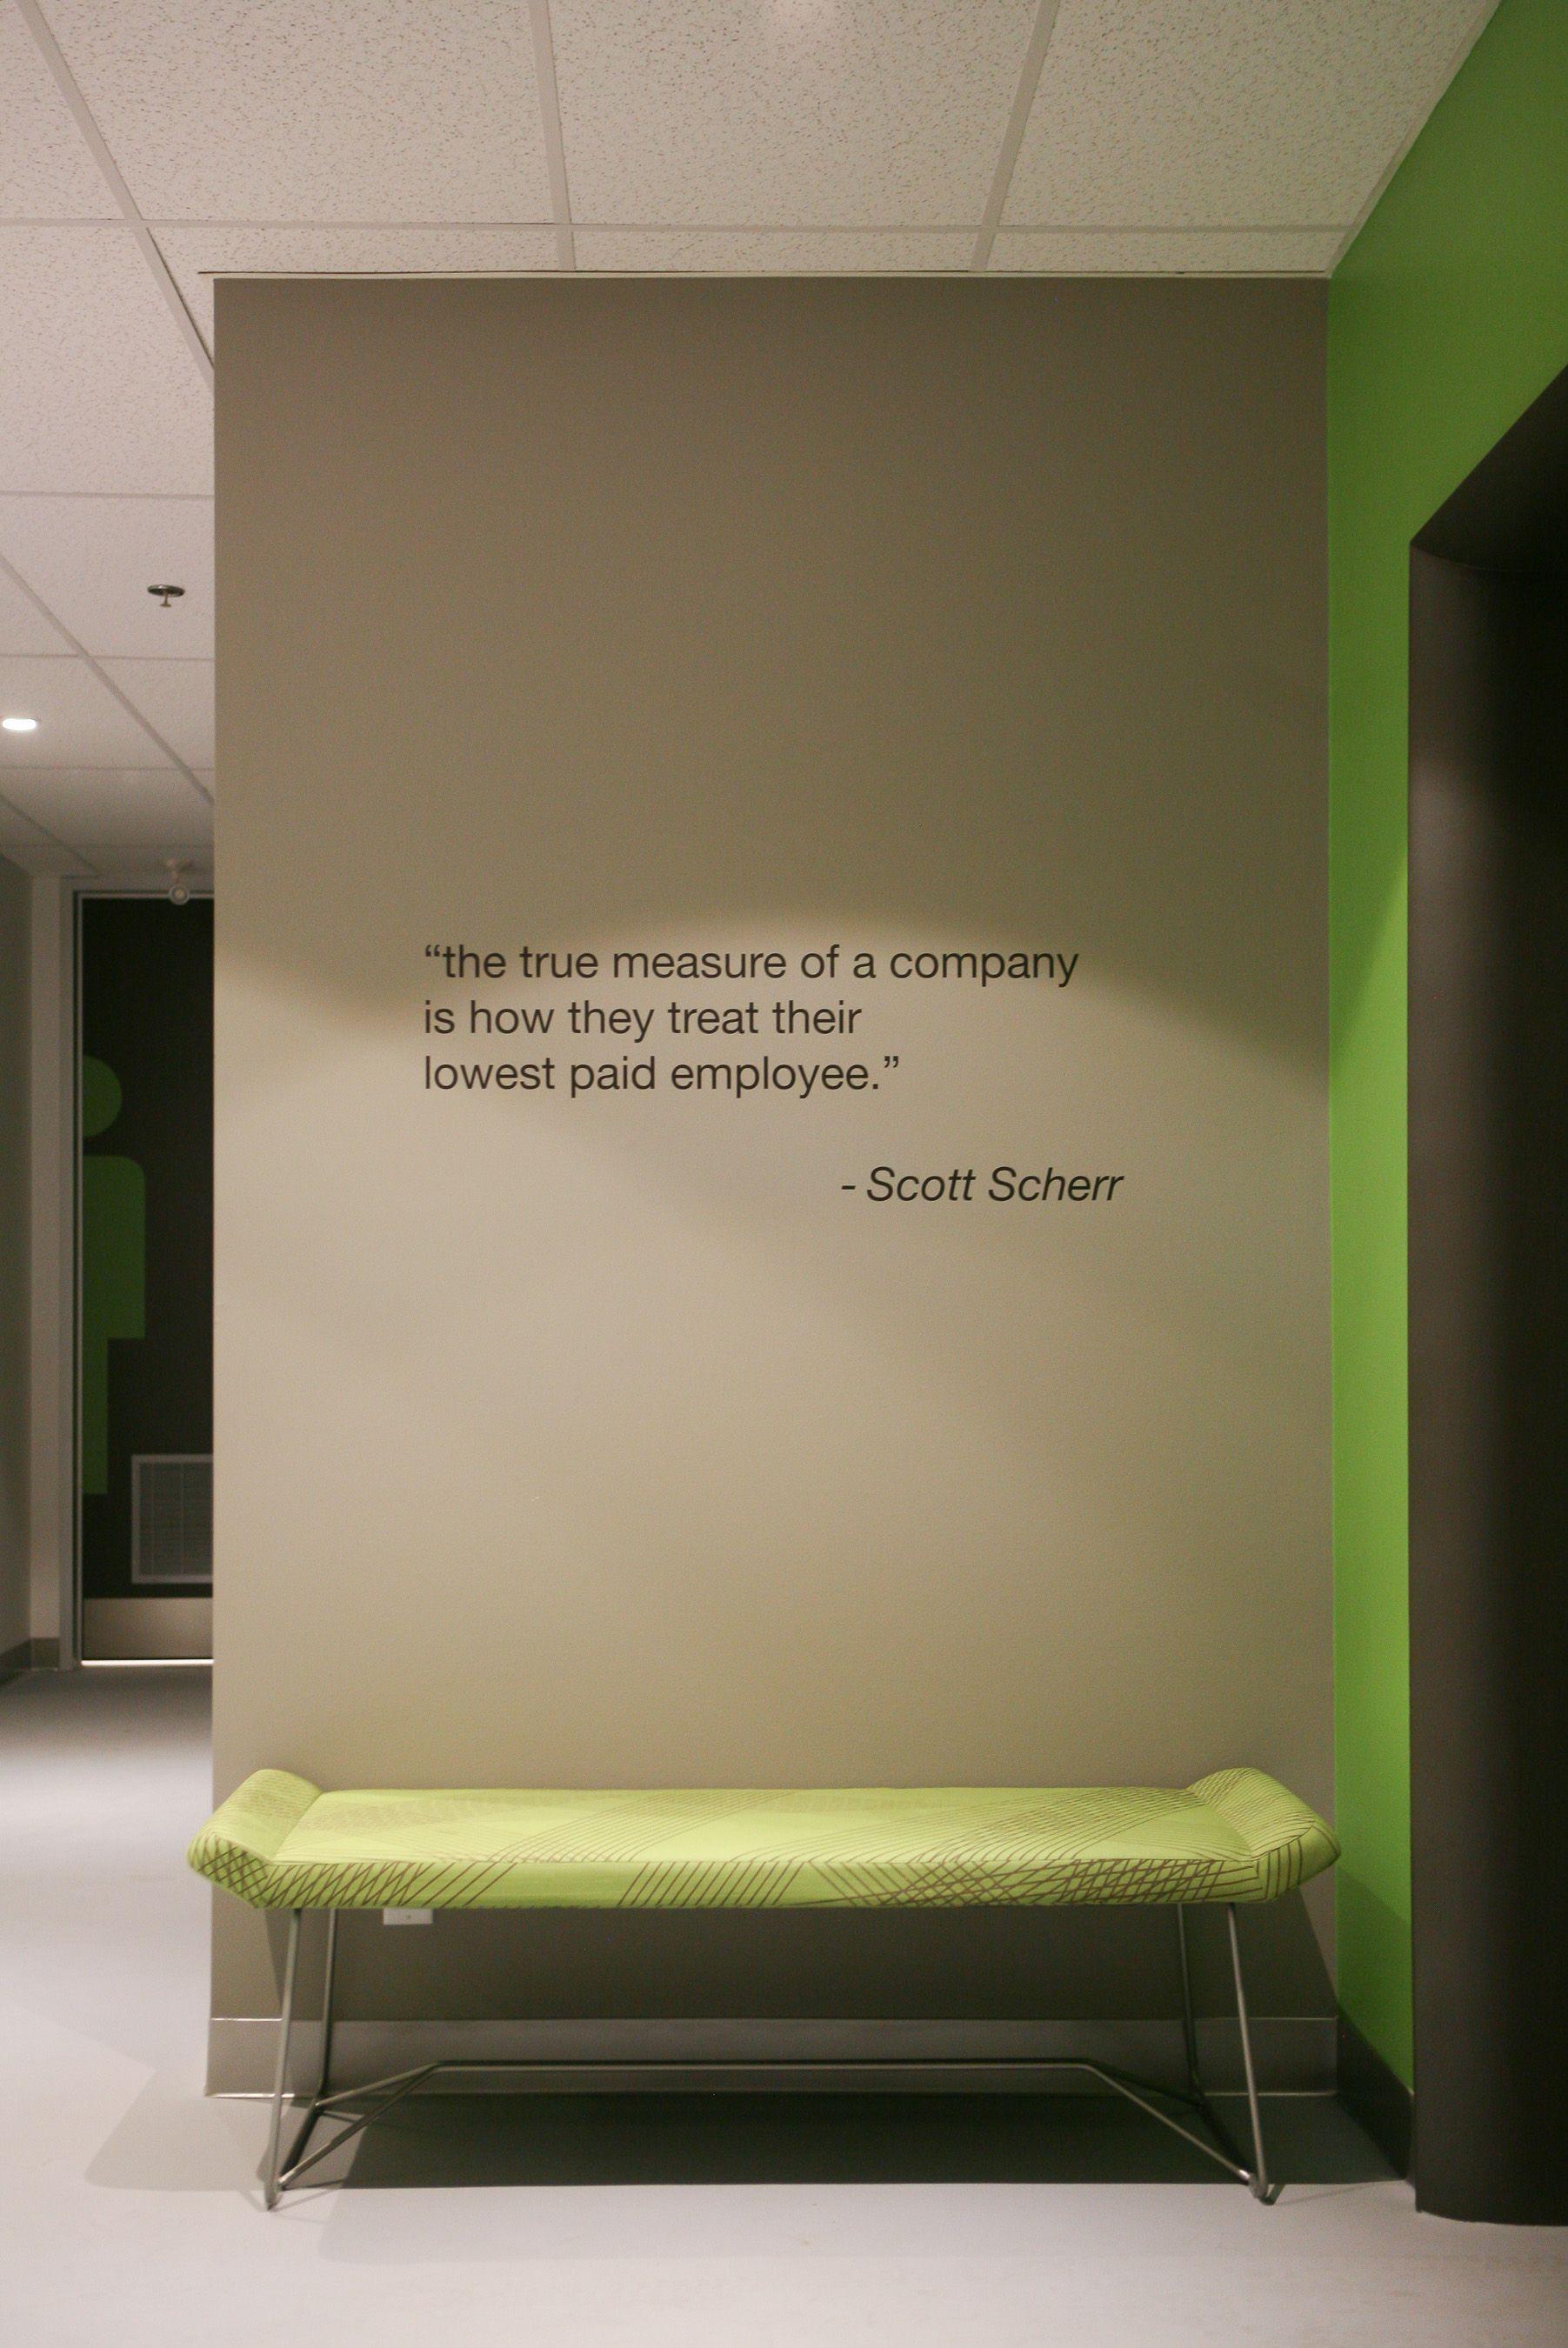 Ultimate software ceo scott scherr says the true measure of a software kristyandbryce Gallery